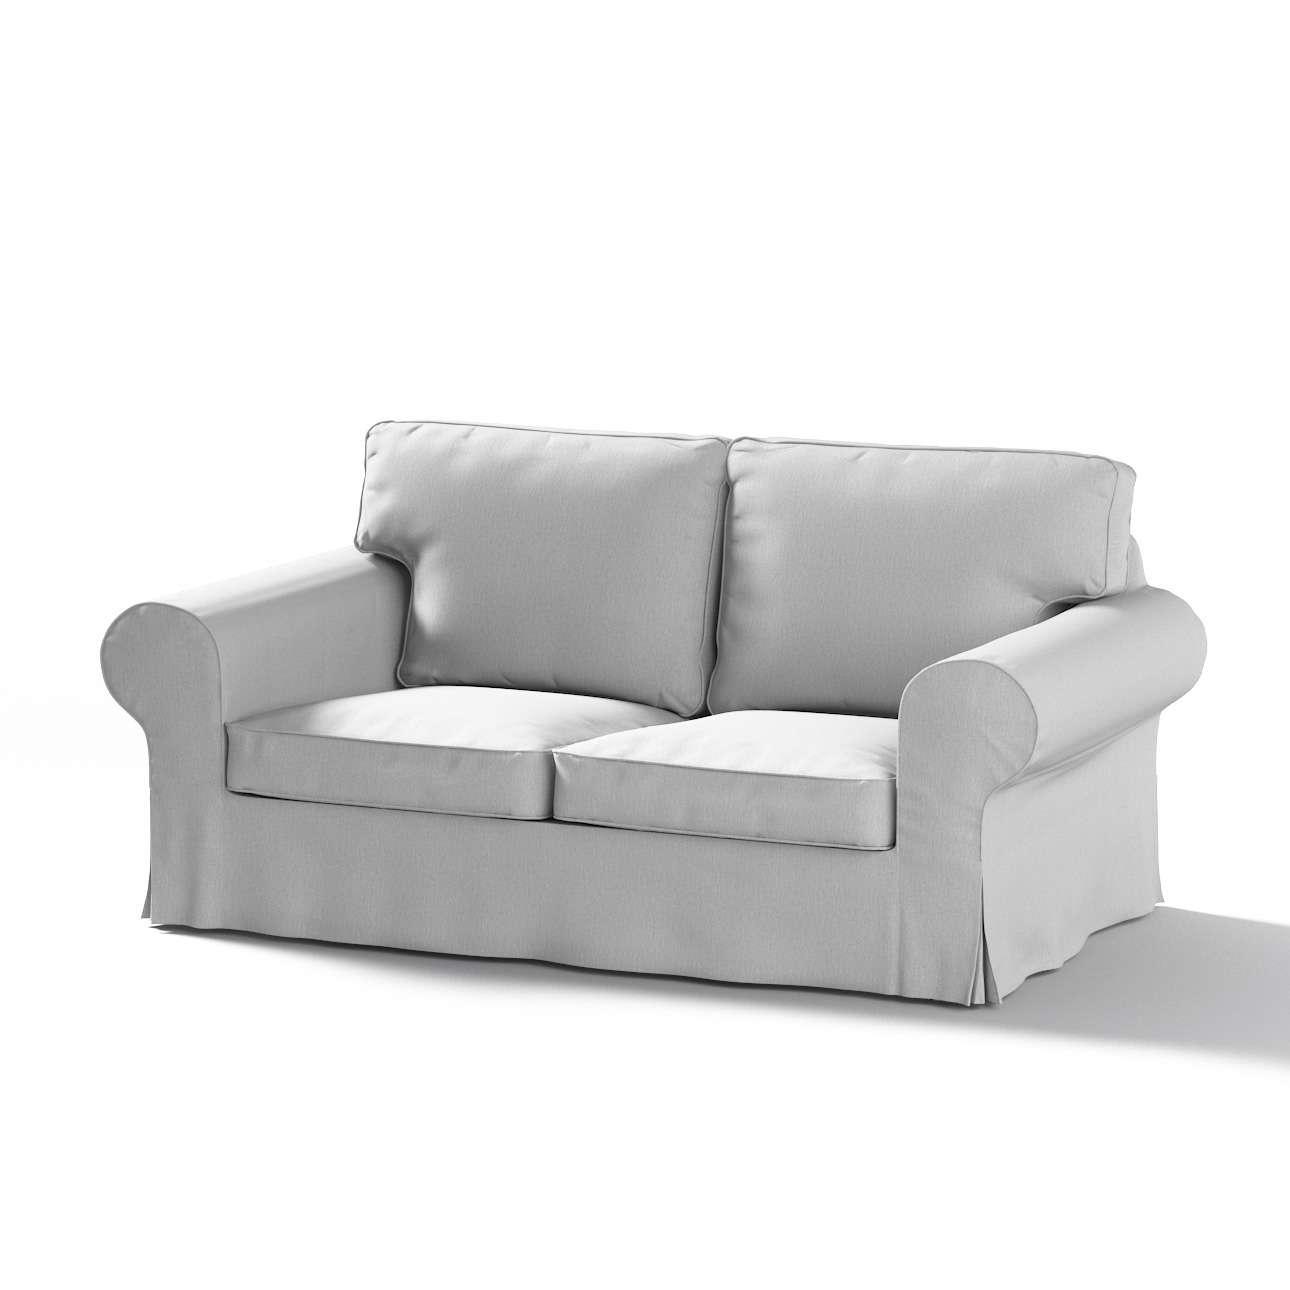 Favorit Ektorp betræk 2 sæder sovesofa gammel model Bredde ca 195cm, Grå JL55